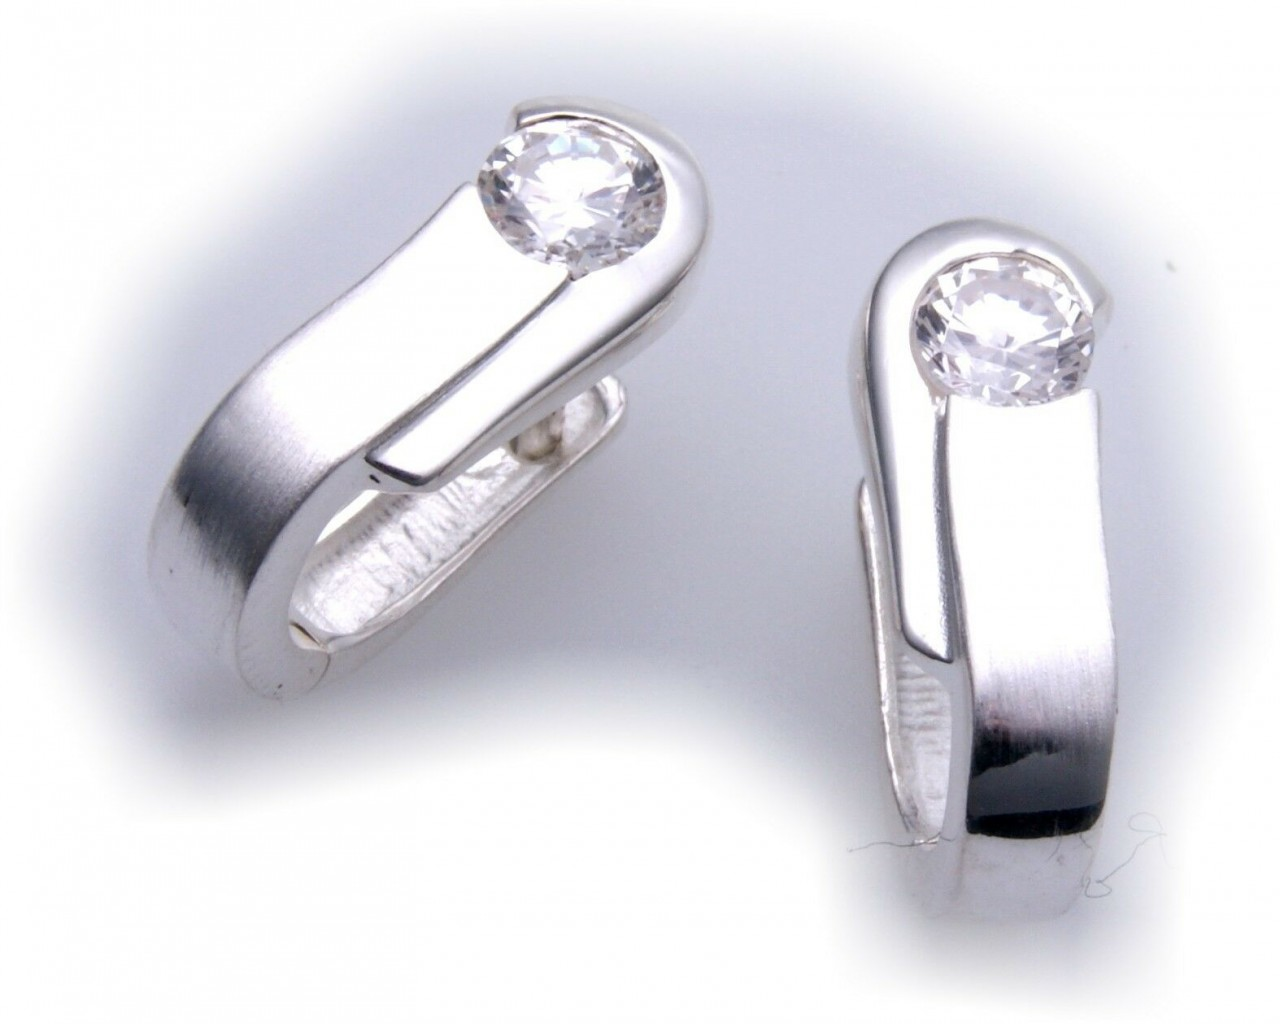 Ohrringe Creolen echt Silber 925 mit Zirkonia teilmatt Sterlingsilber